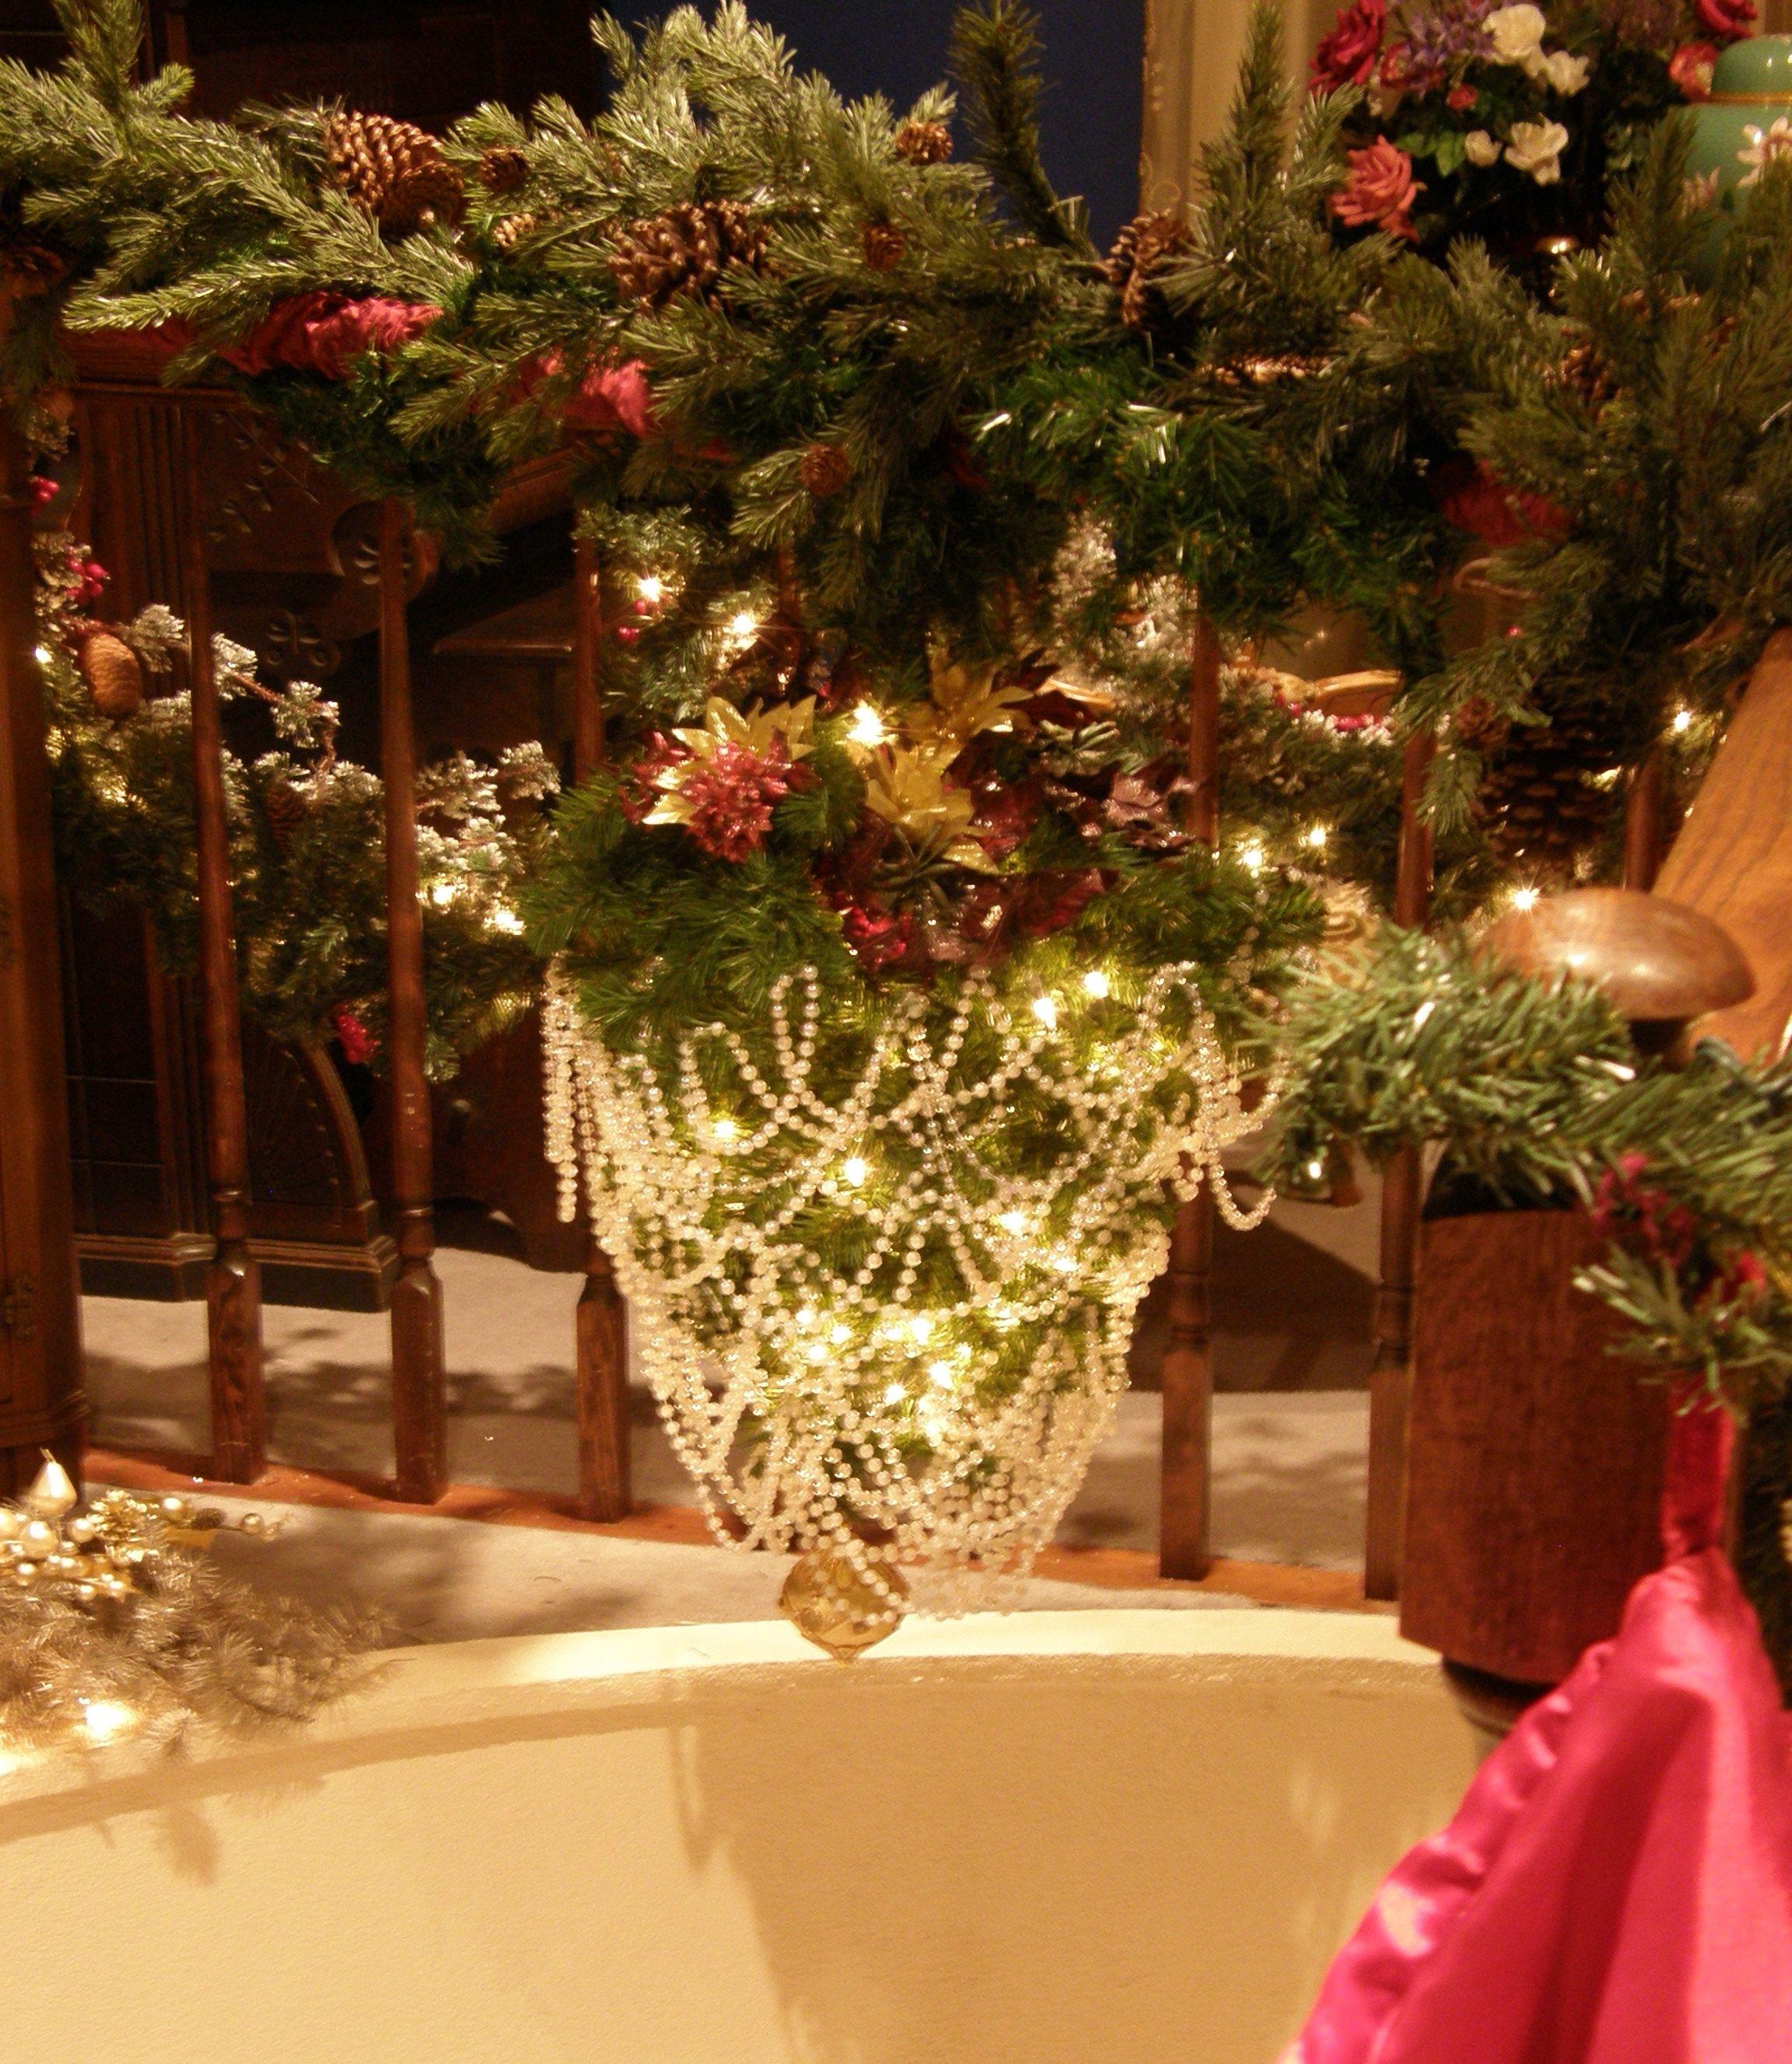 Christmas Decorations 3 – Boudoir Tree